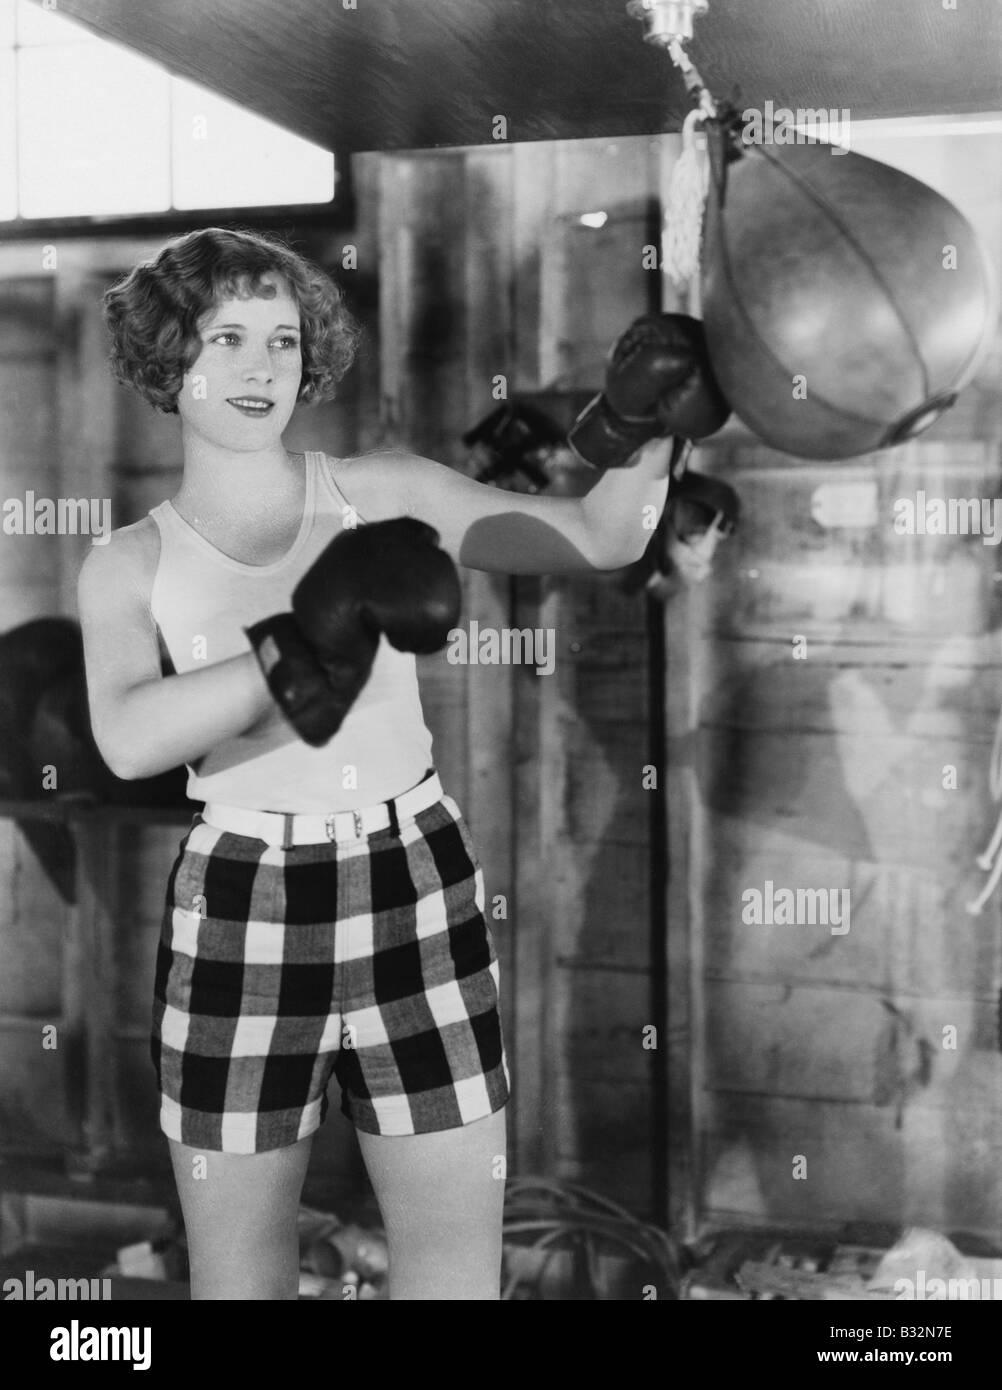 Female boxer using punching bag - Stock Image